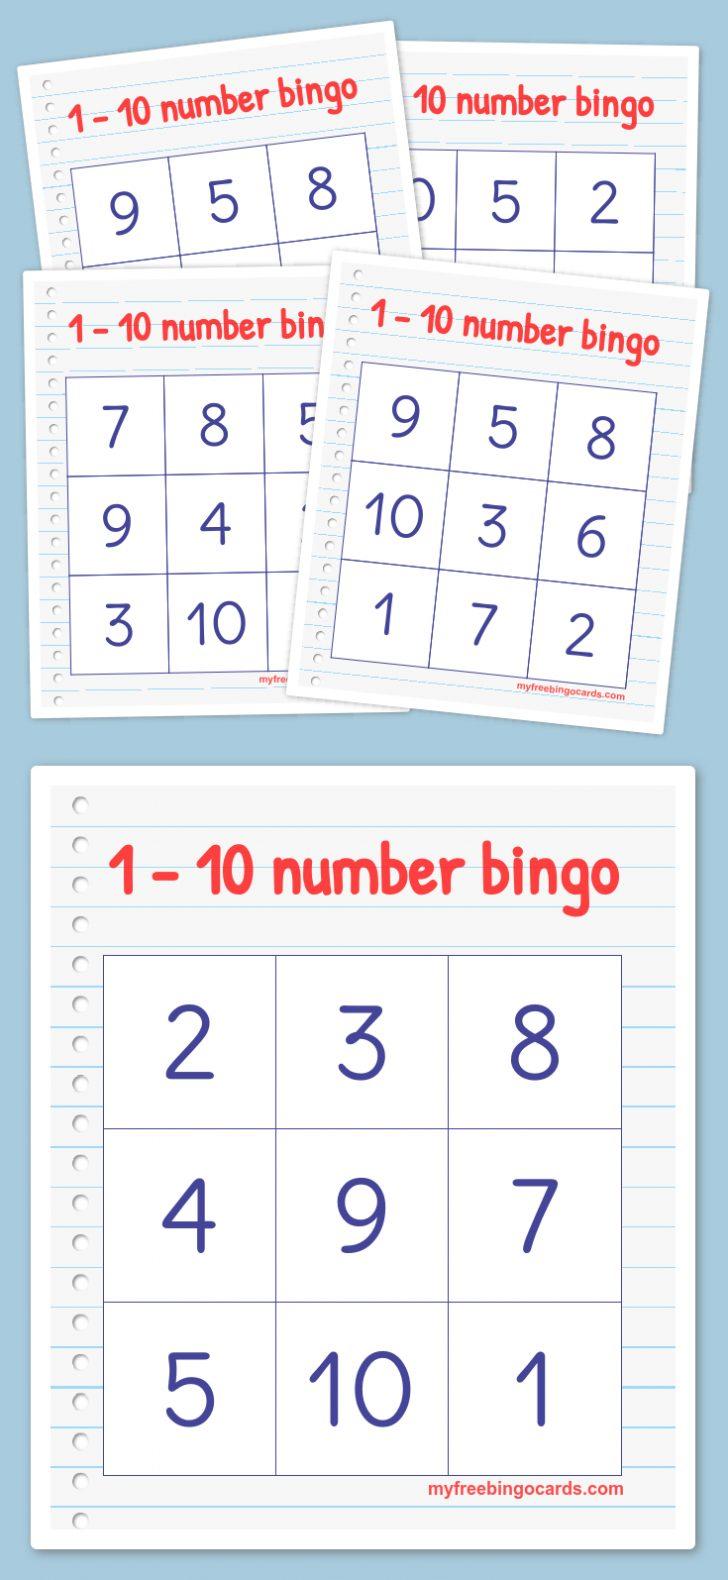 Bingo Cards For Teachers Printable Free